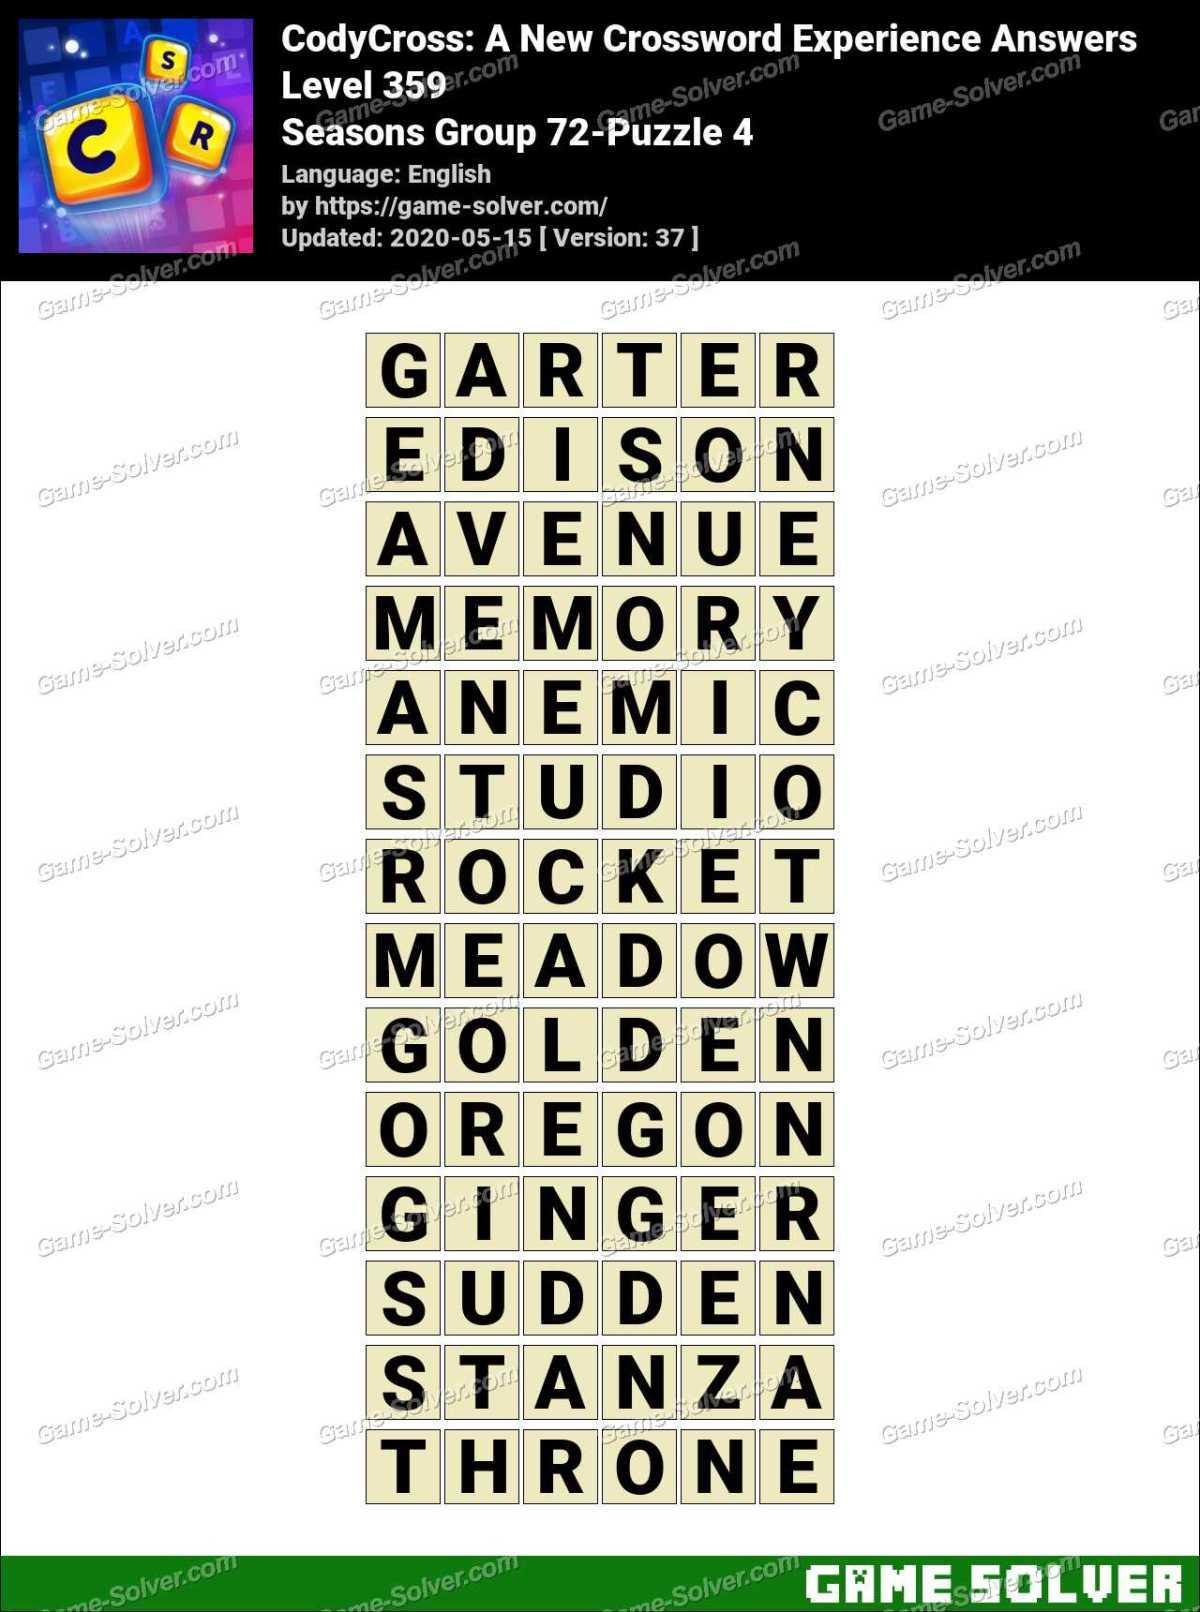 CodyCross Seasons Group 72-Puzzle 4 Answers